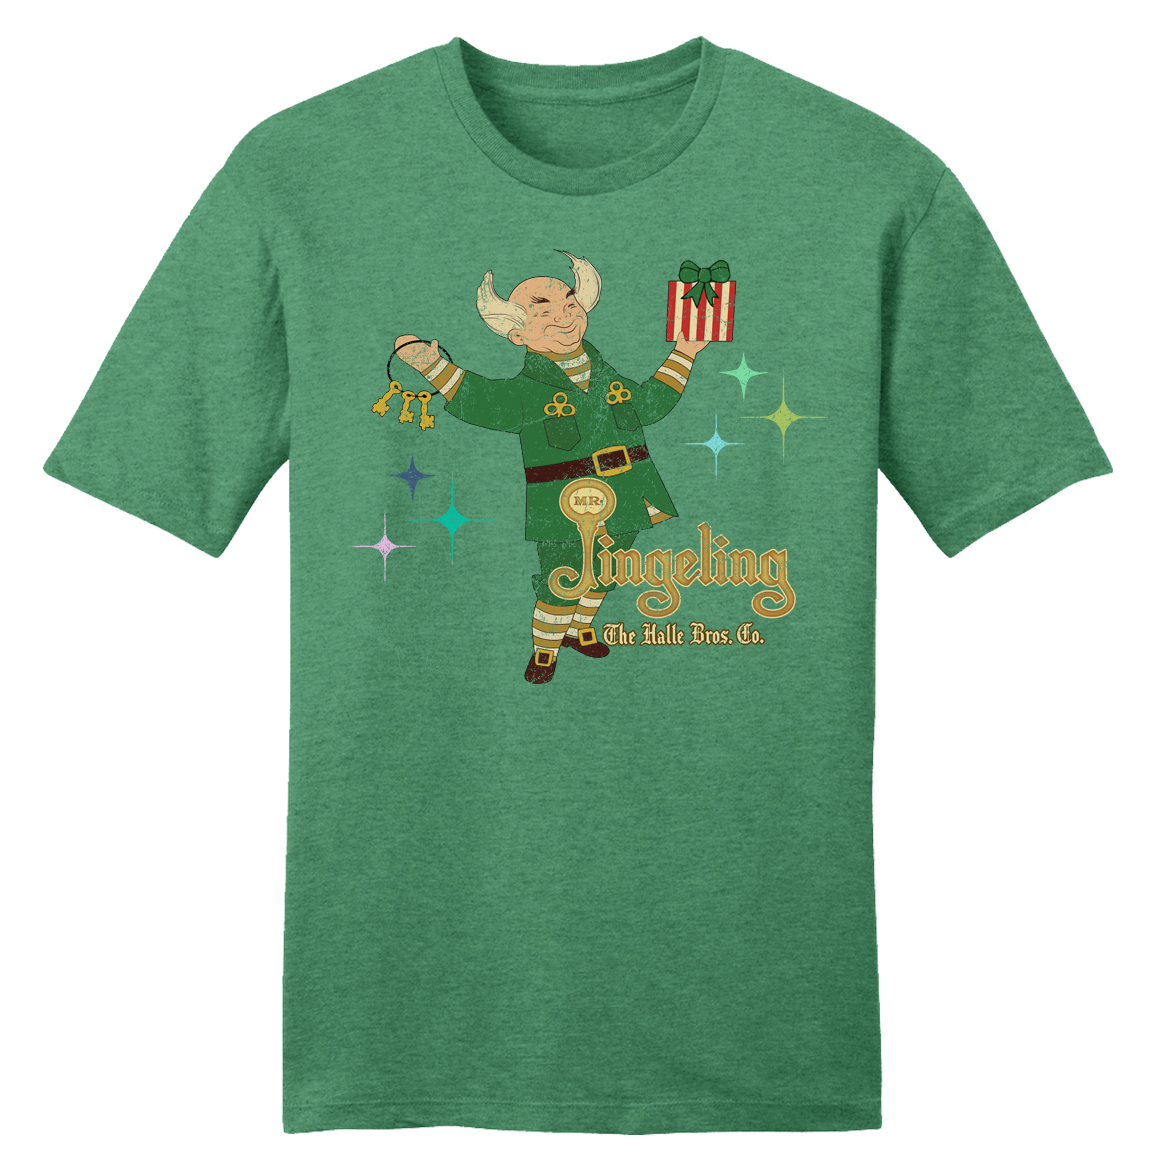 Mr. Jingeling Retro T-Shirt